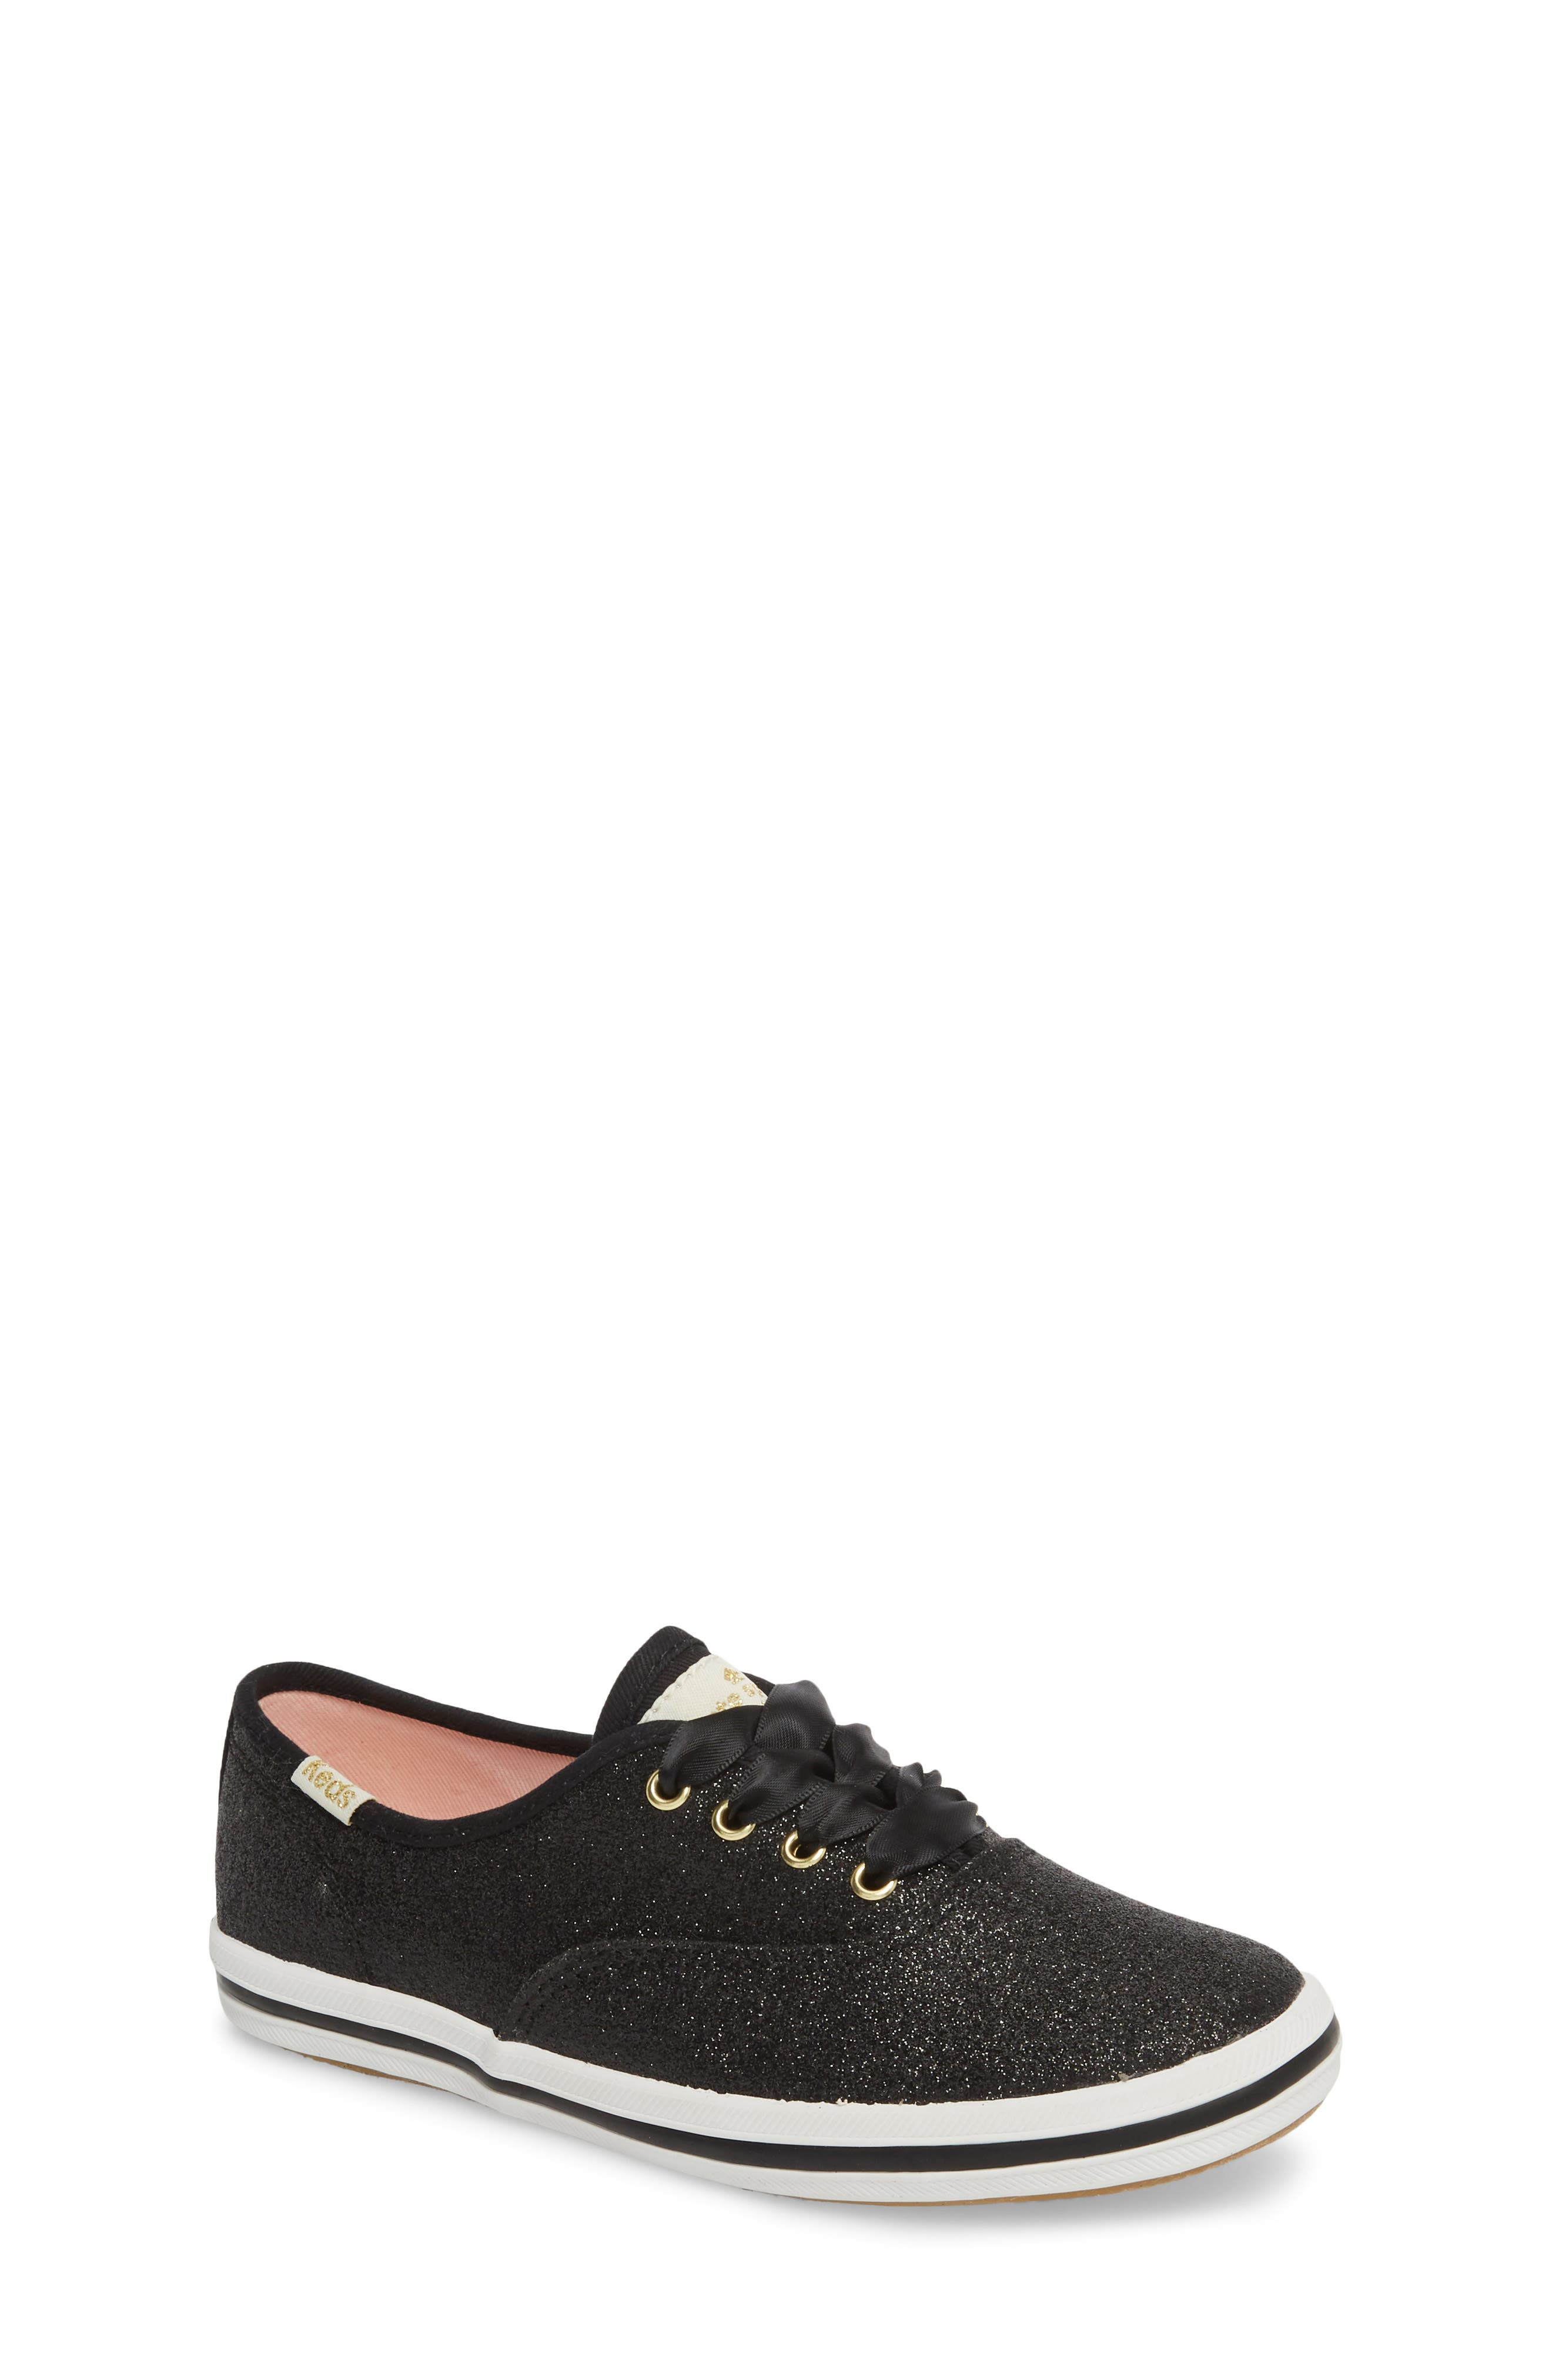 x kate spade new york Champion Glitter Sneaker,                         Main,                         color, Black